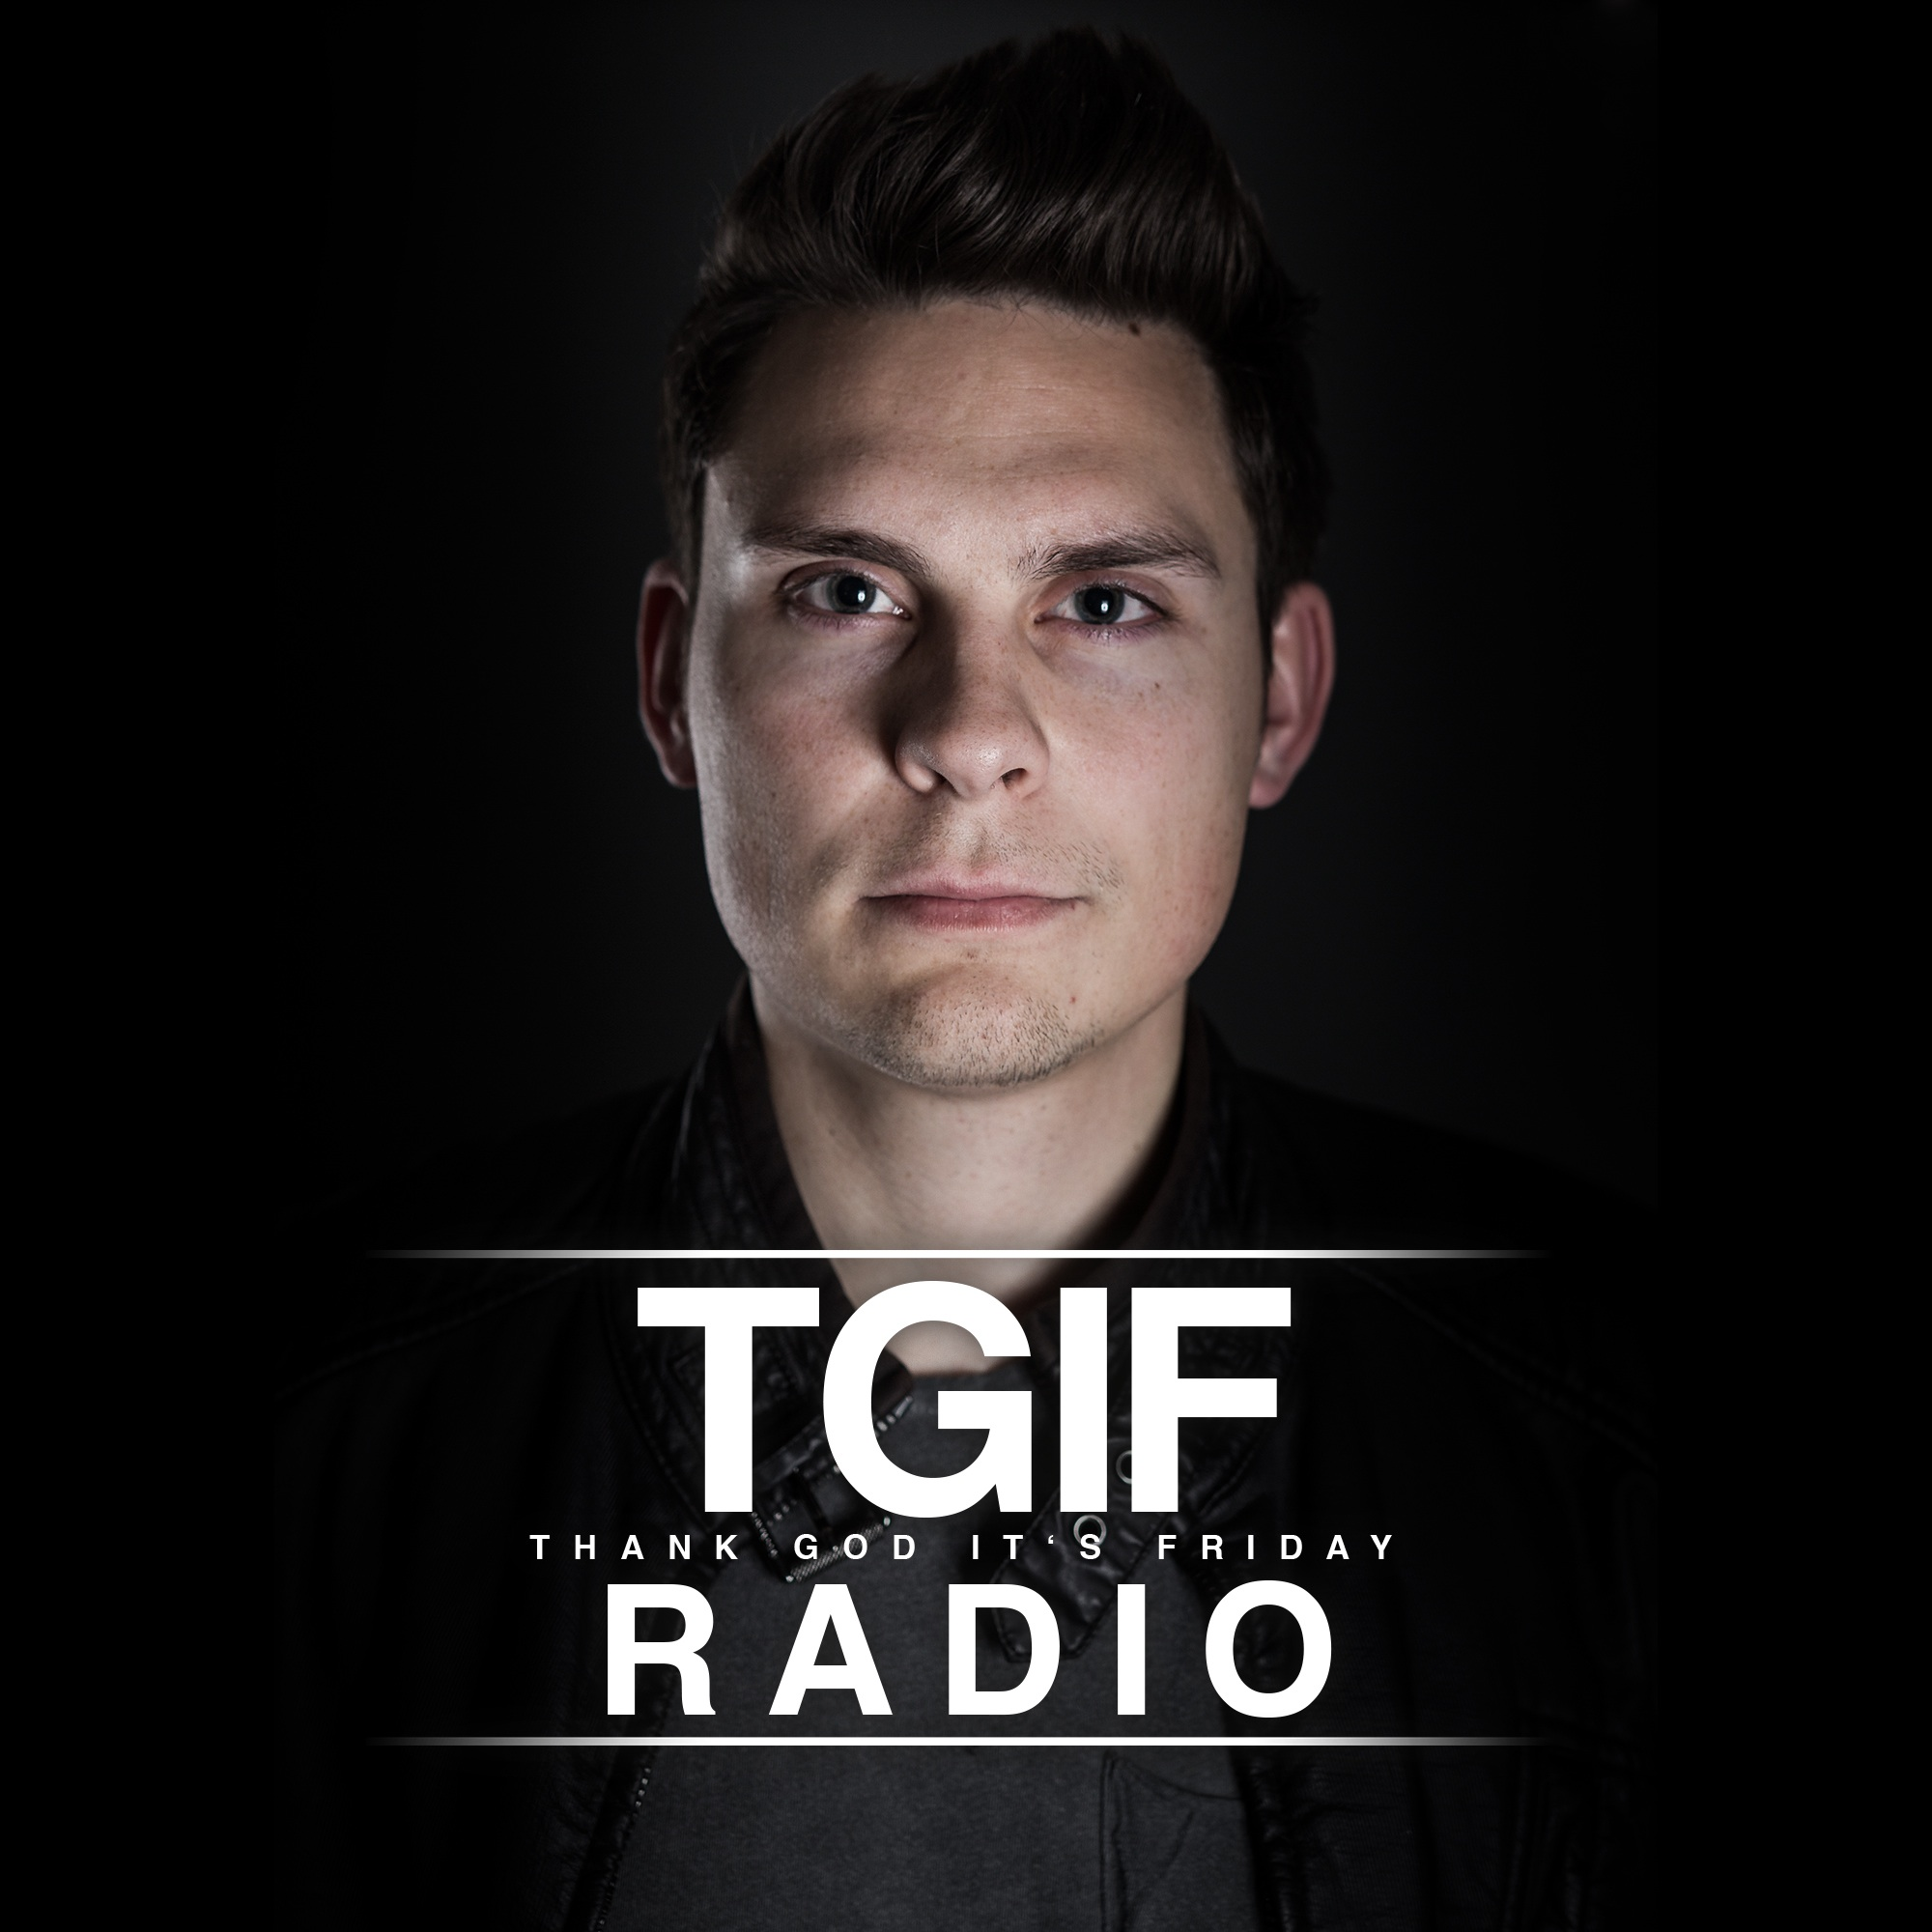 LeCoast TGIF Radio